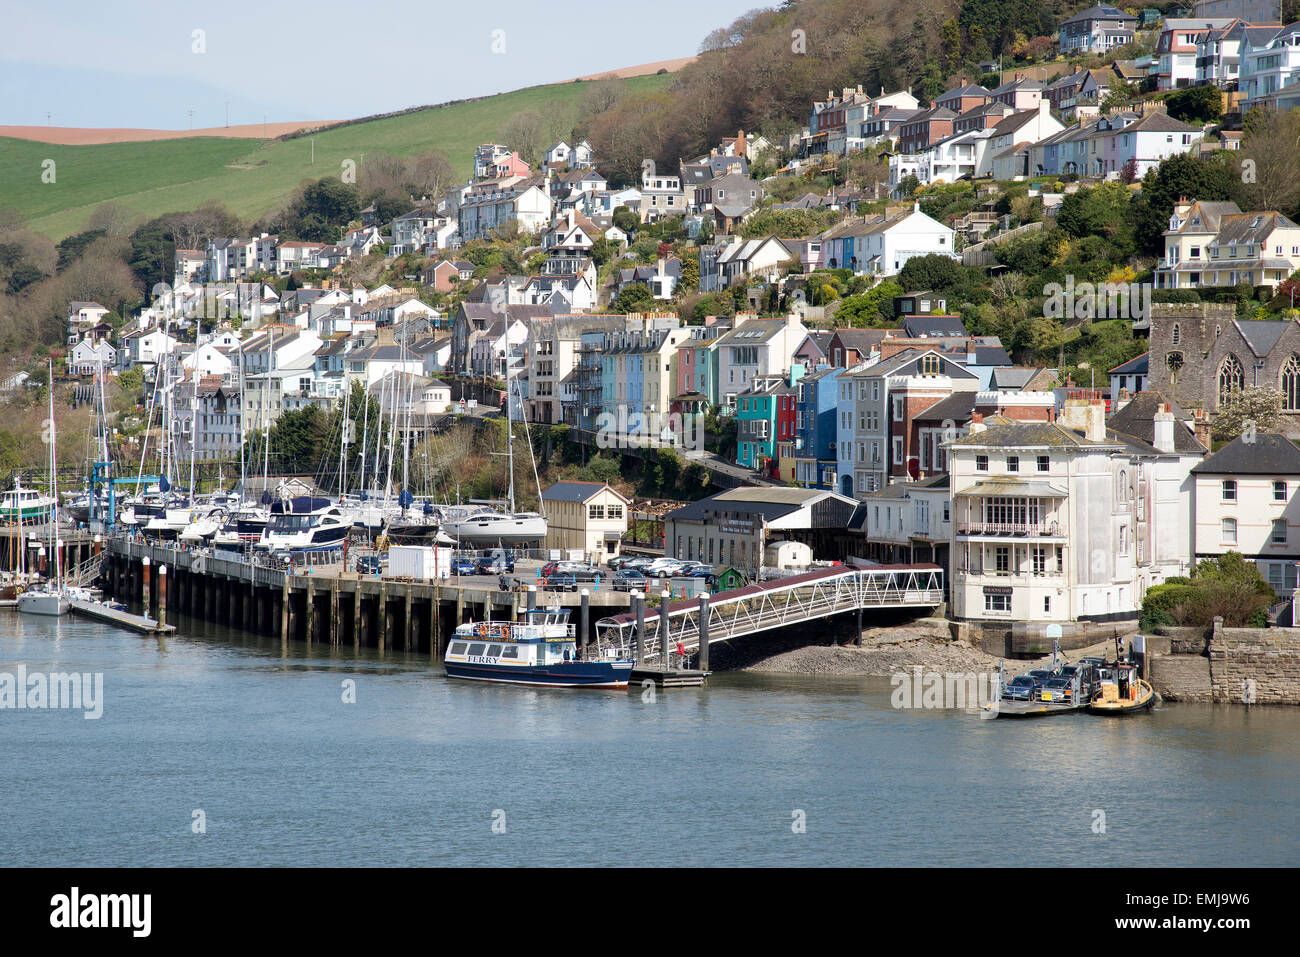 Kingswear a small Devonshire town overlooks the River Dart Devon England UK - Stock Image